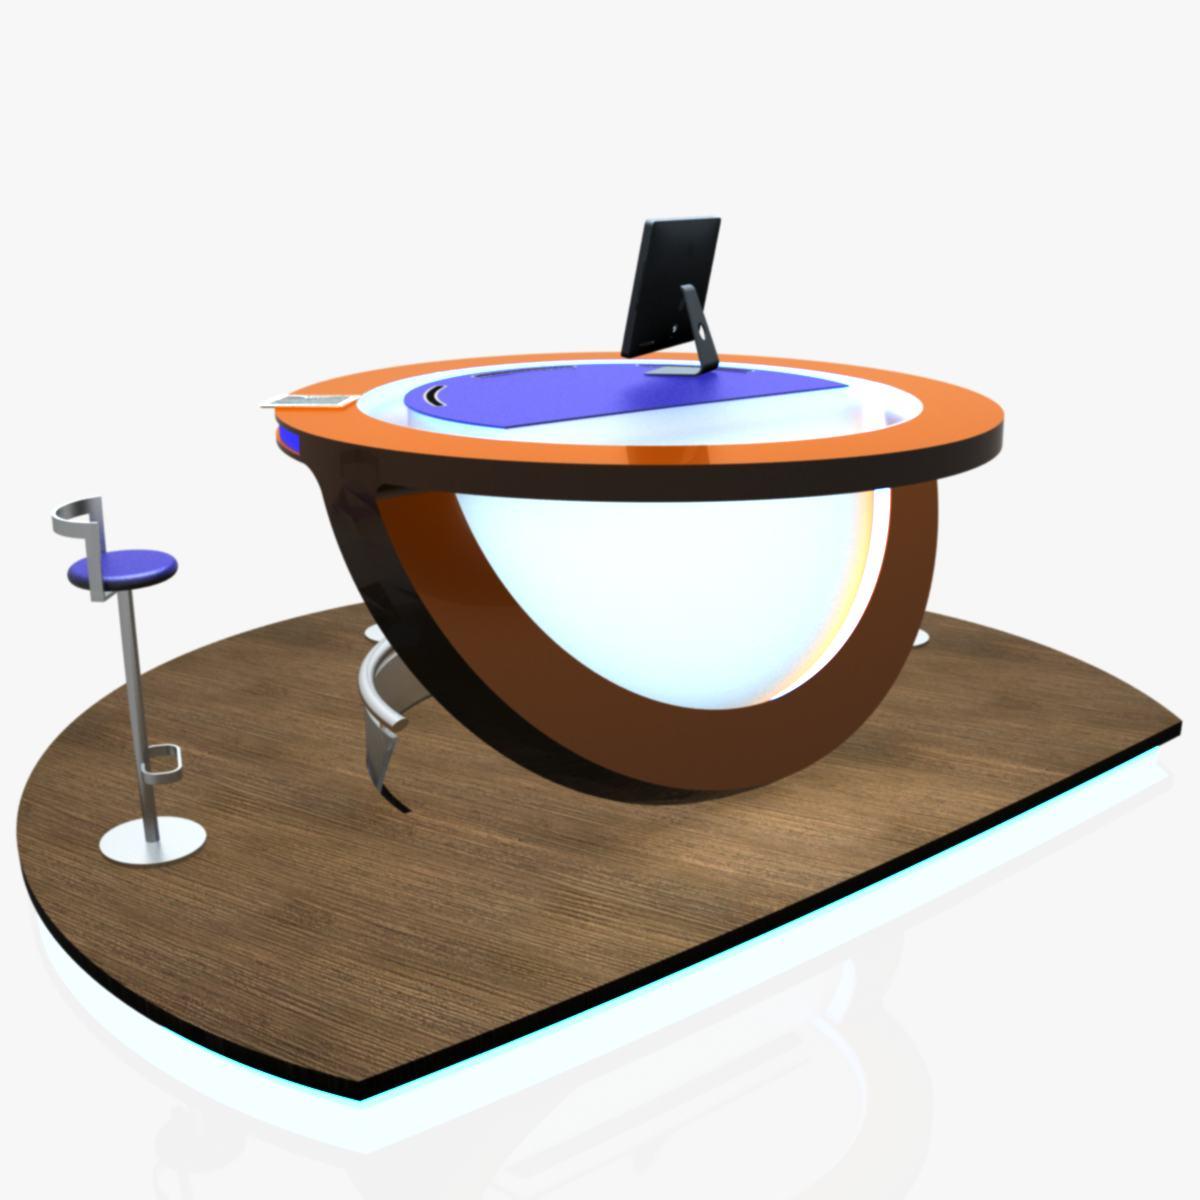 Virtual Tv Studio News Podium Desk Chair Imac27 Ip 3d model max dxf fbx obj 223577